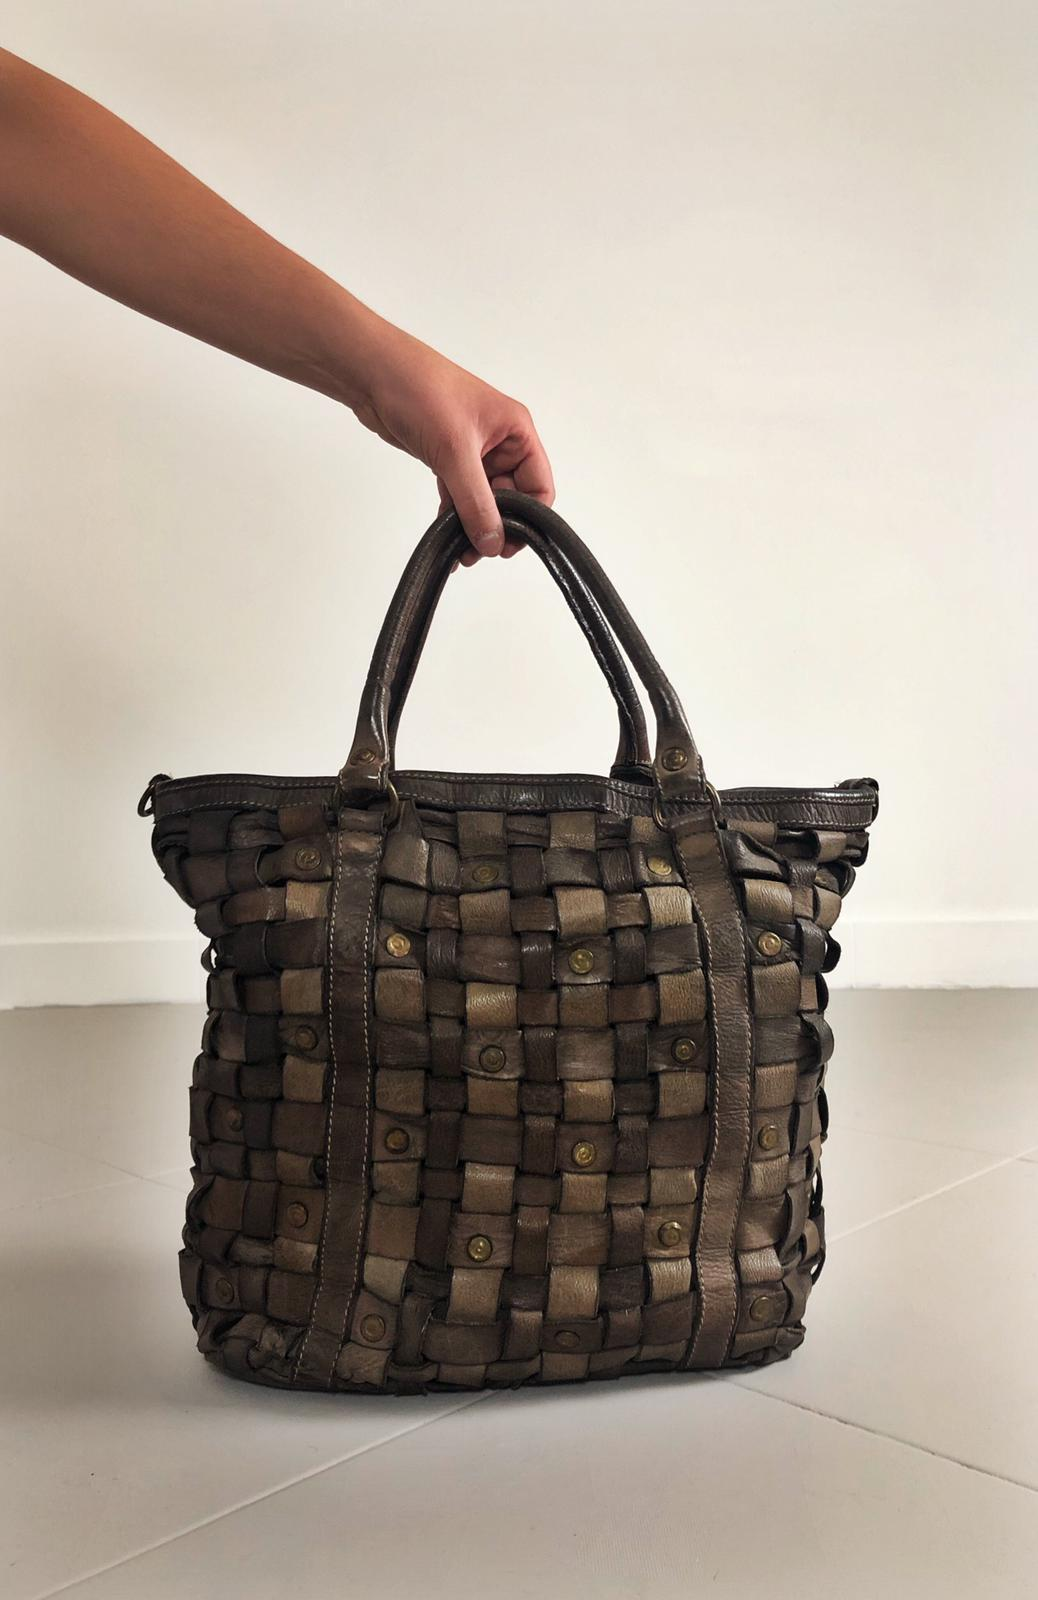 Intreccio 101 handmade woven leather bag